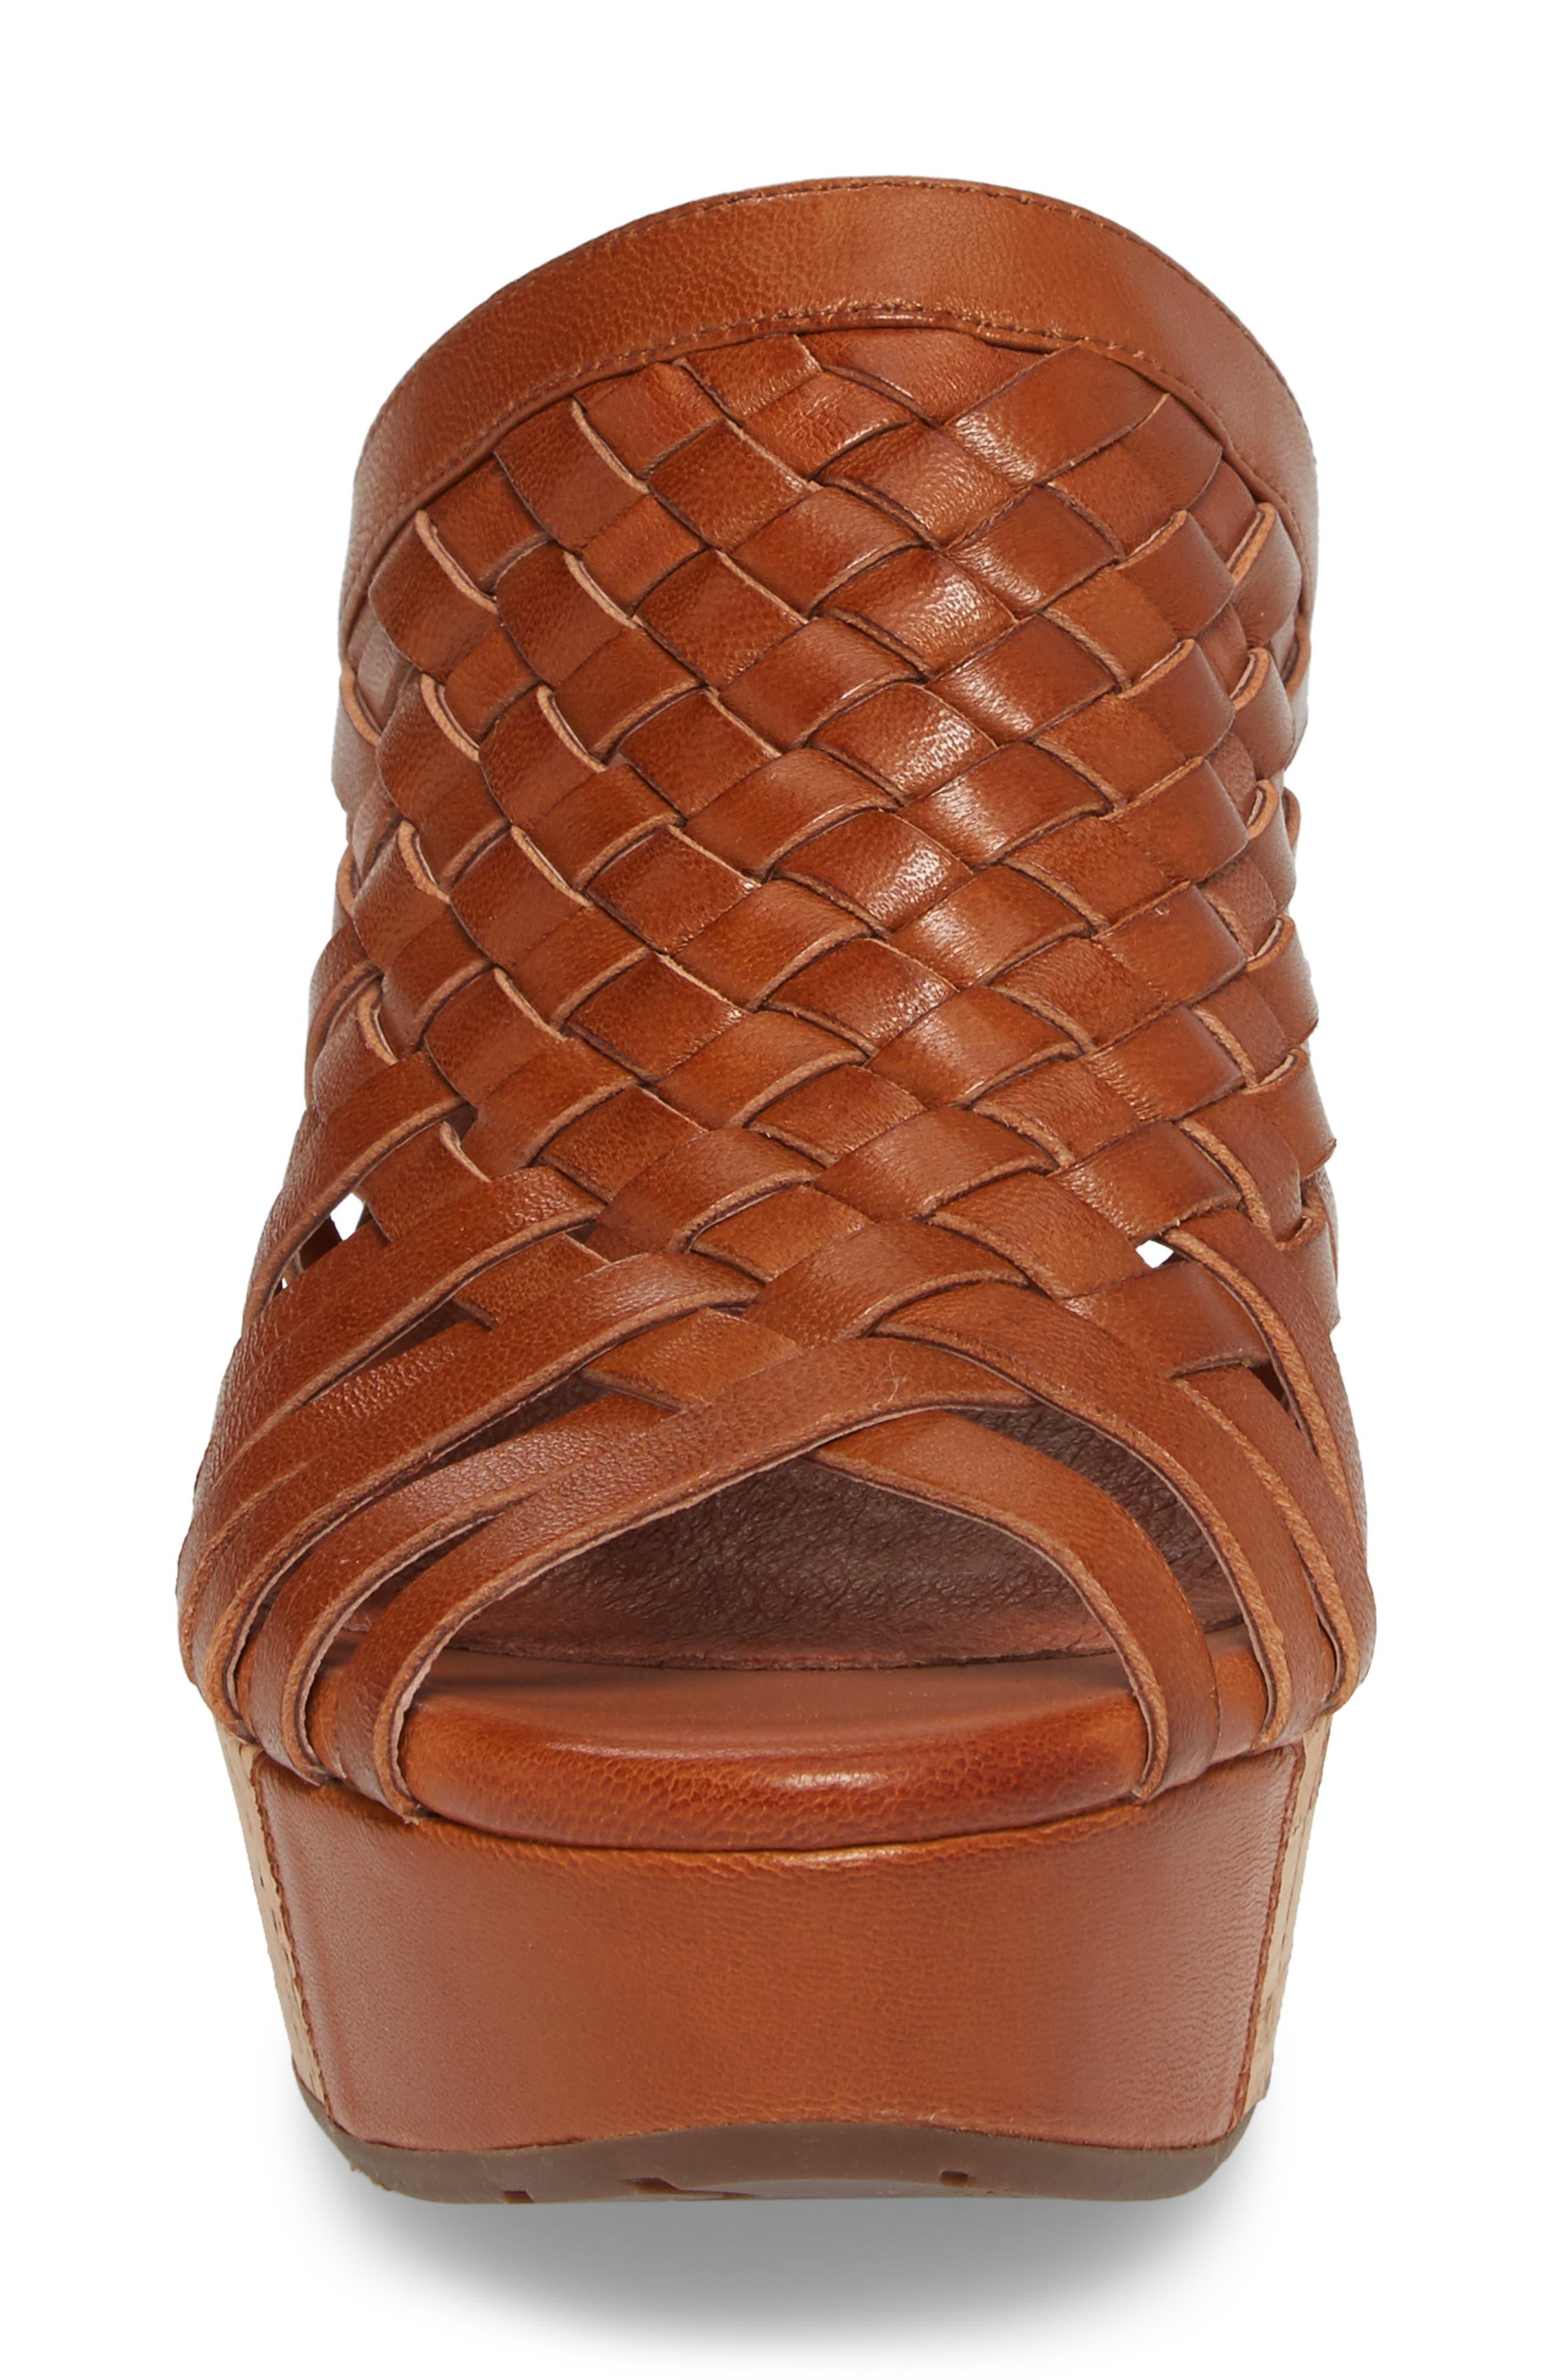 Walda Platform Wedge Sandal,                             Alternate thumbnail 11, color,